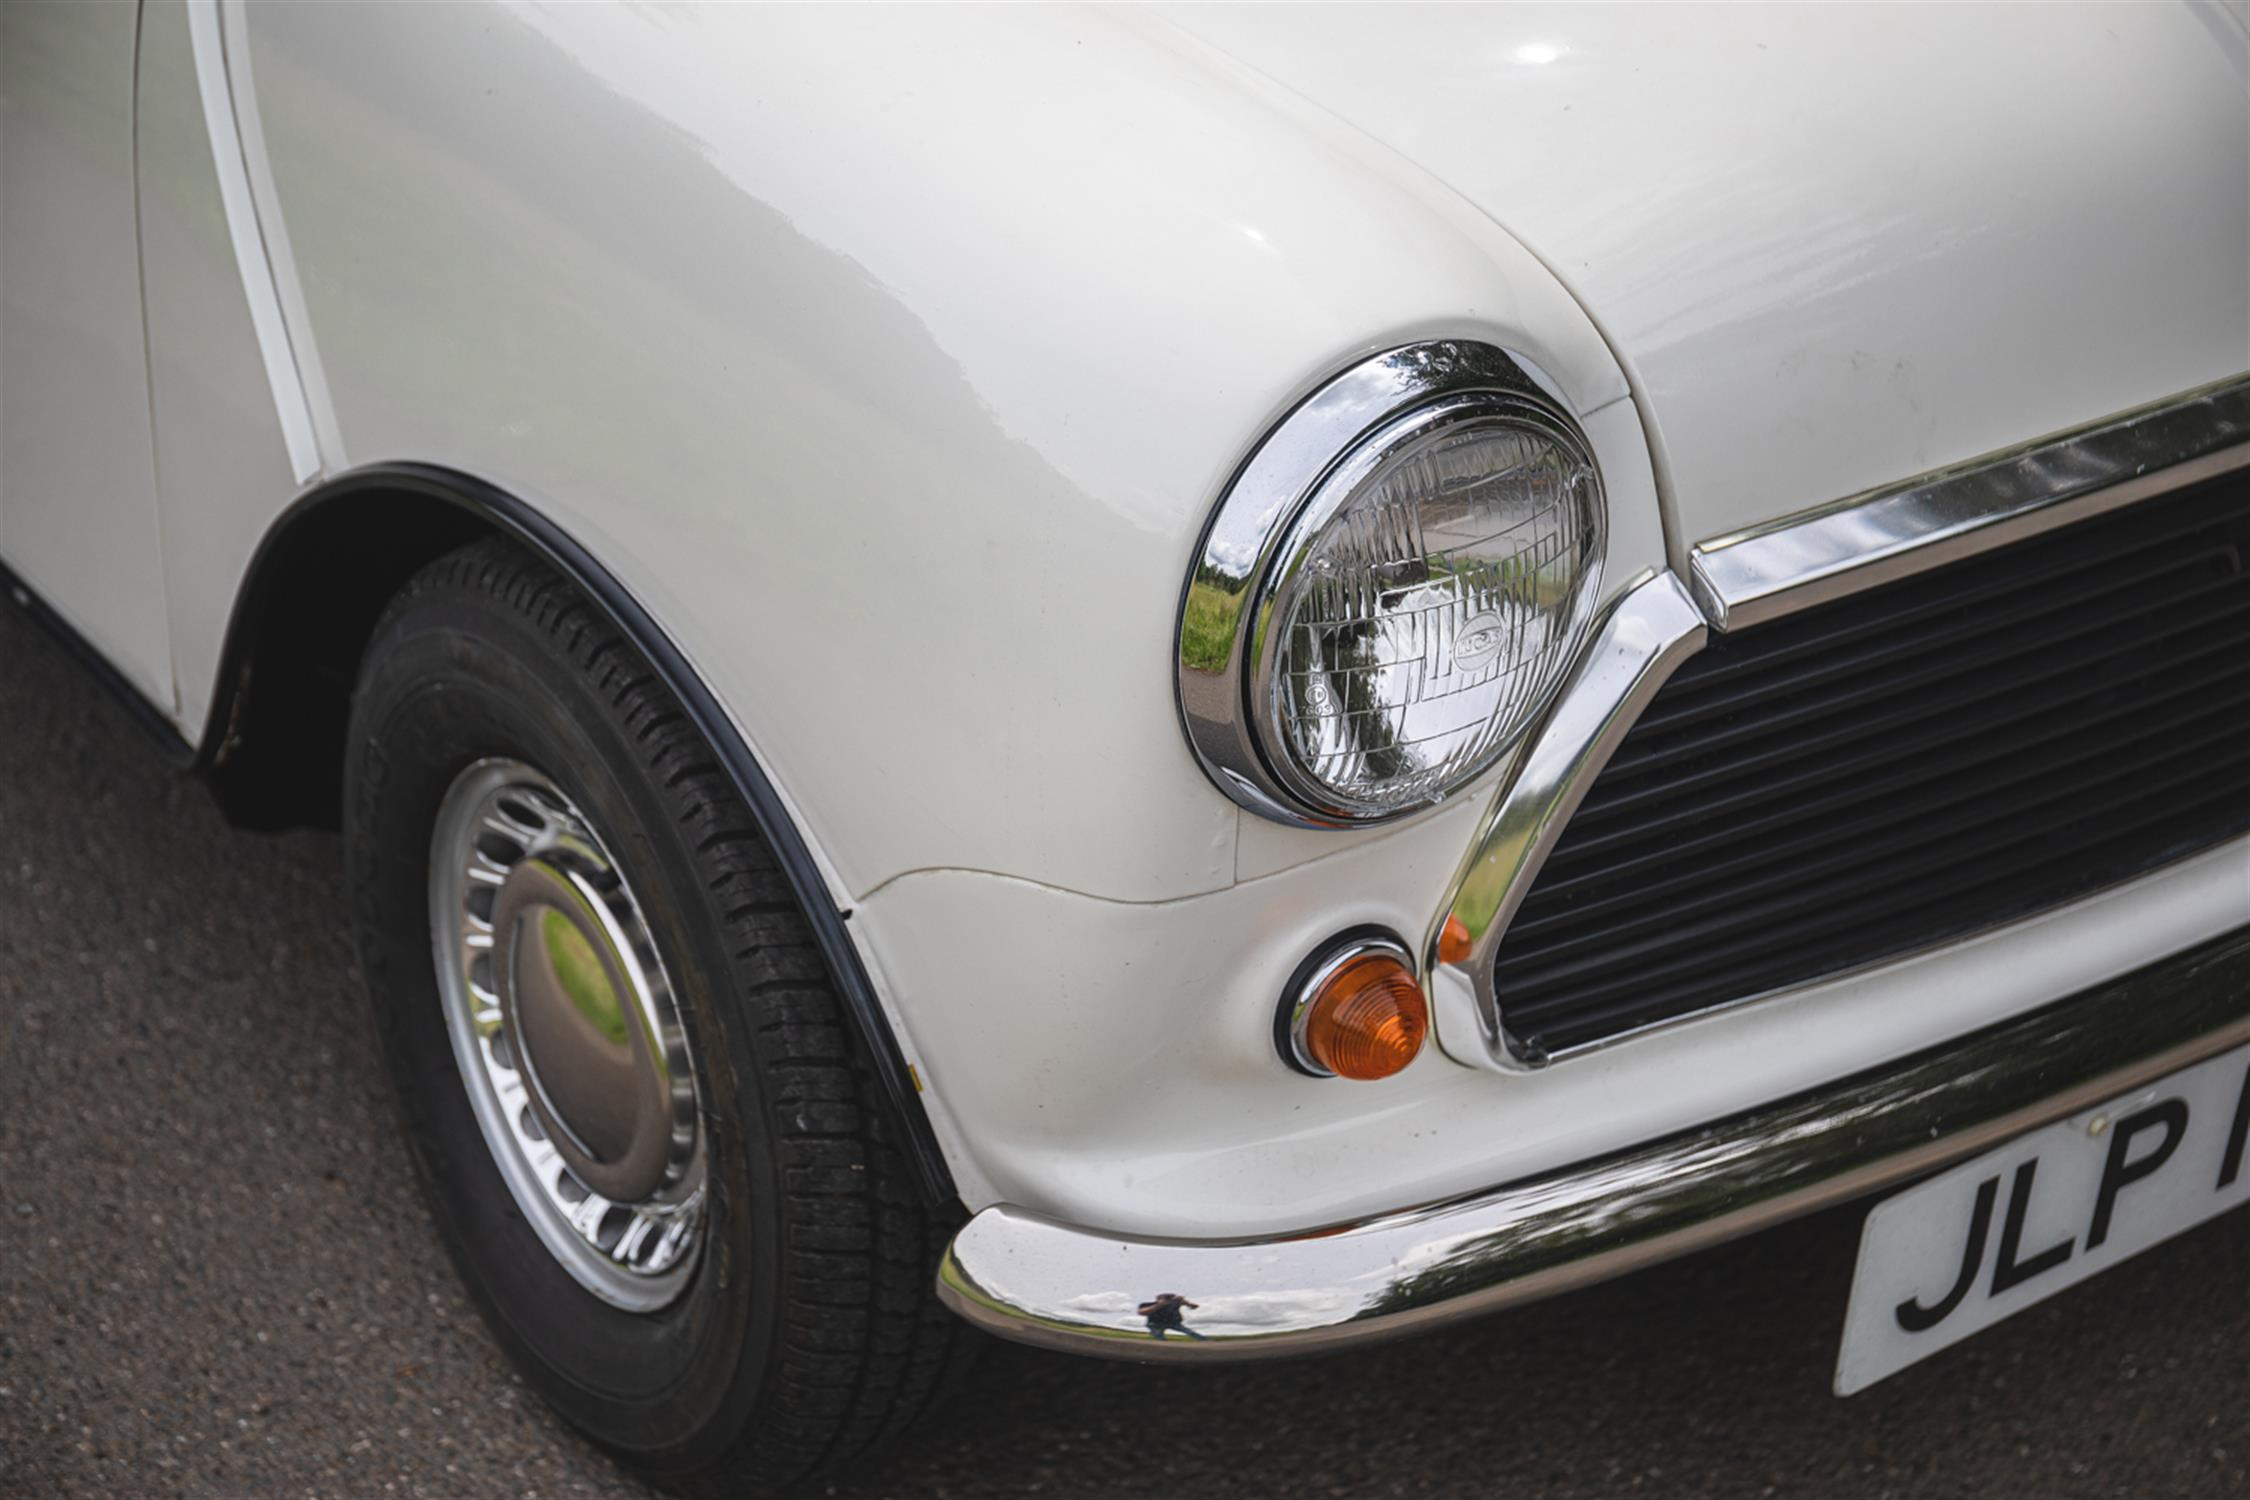 1979 Austin Mini 1000 (Auto) - 2,699 Miles - Image 10 of 10